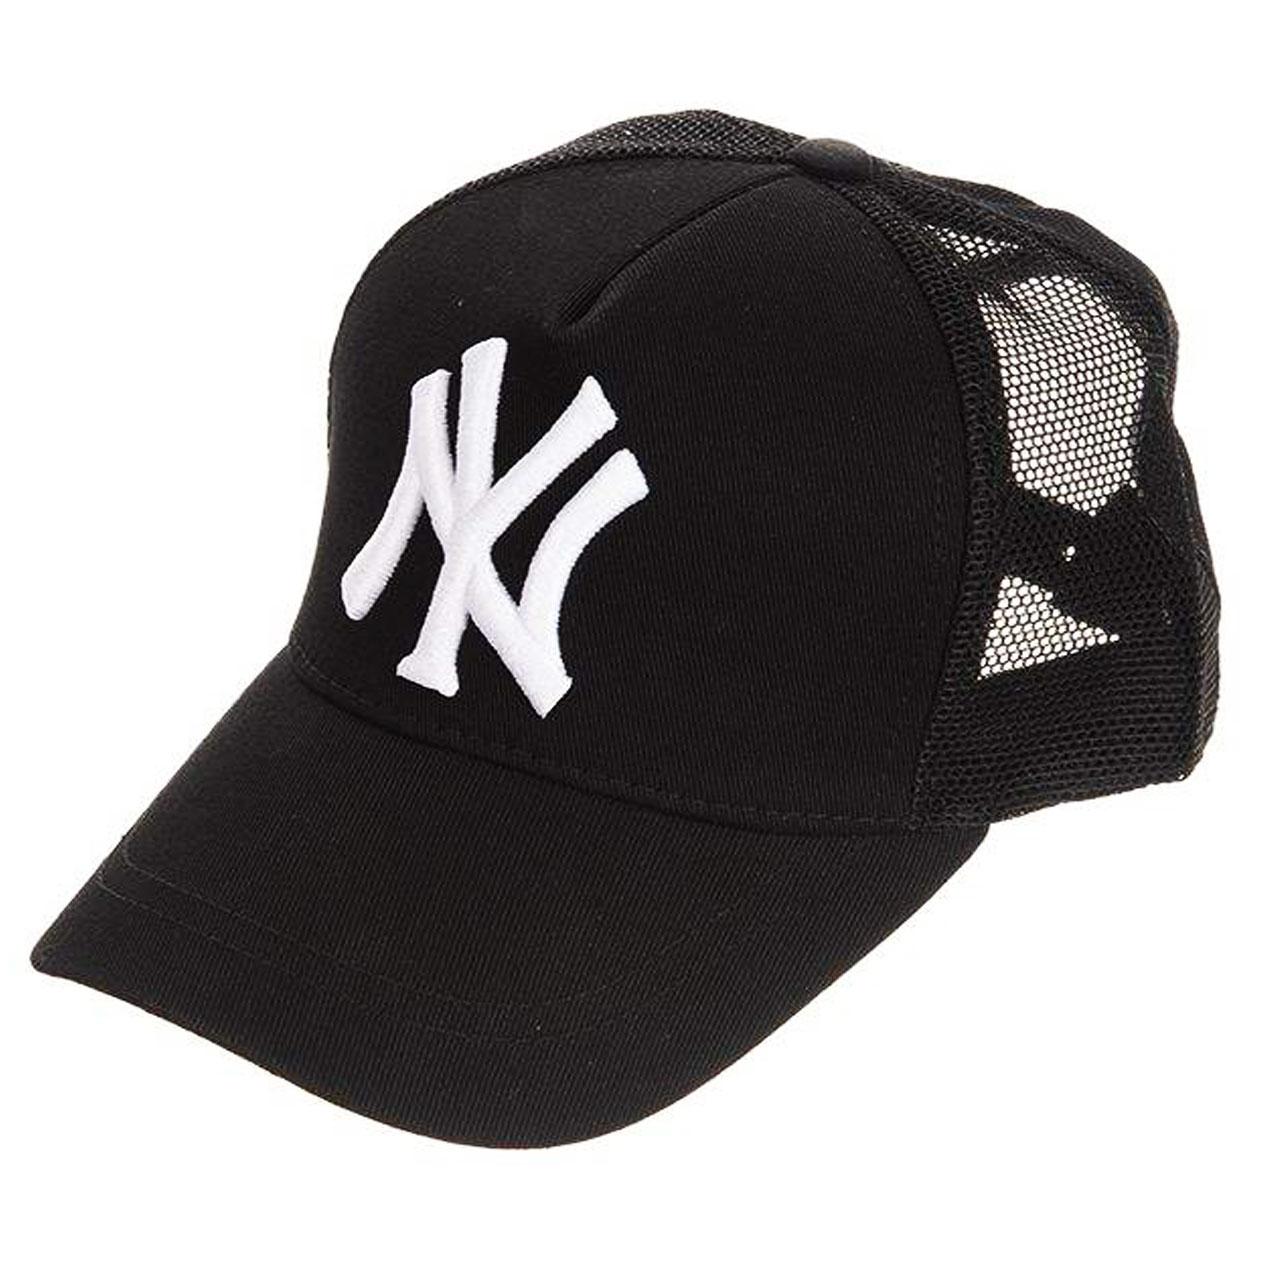 کلاه کپ مدل WBHM